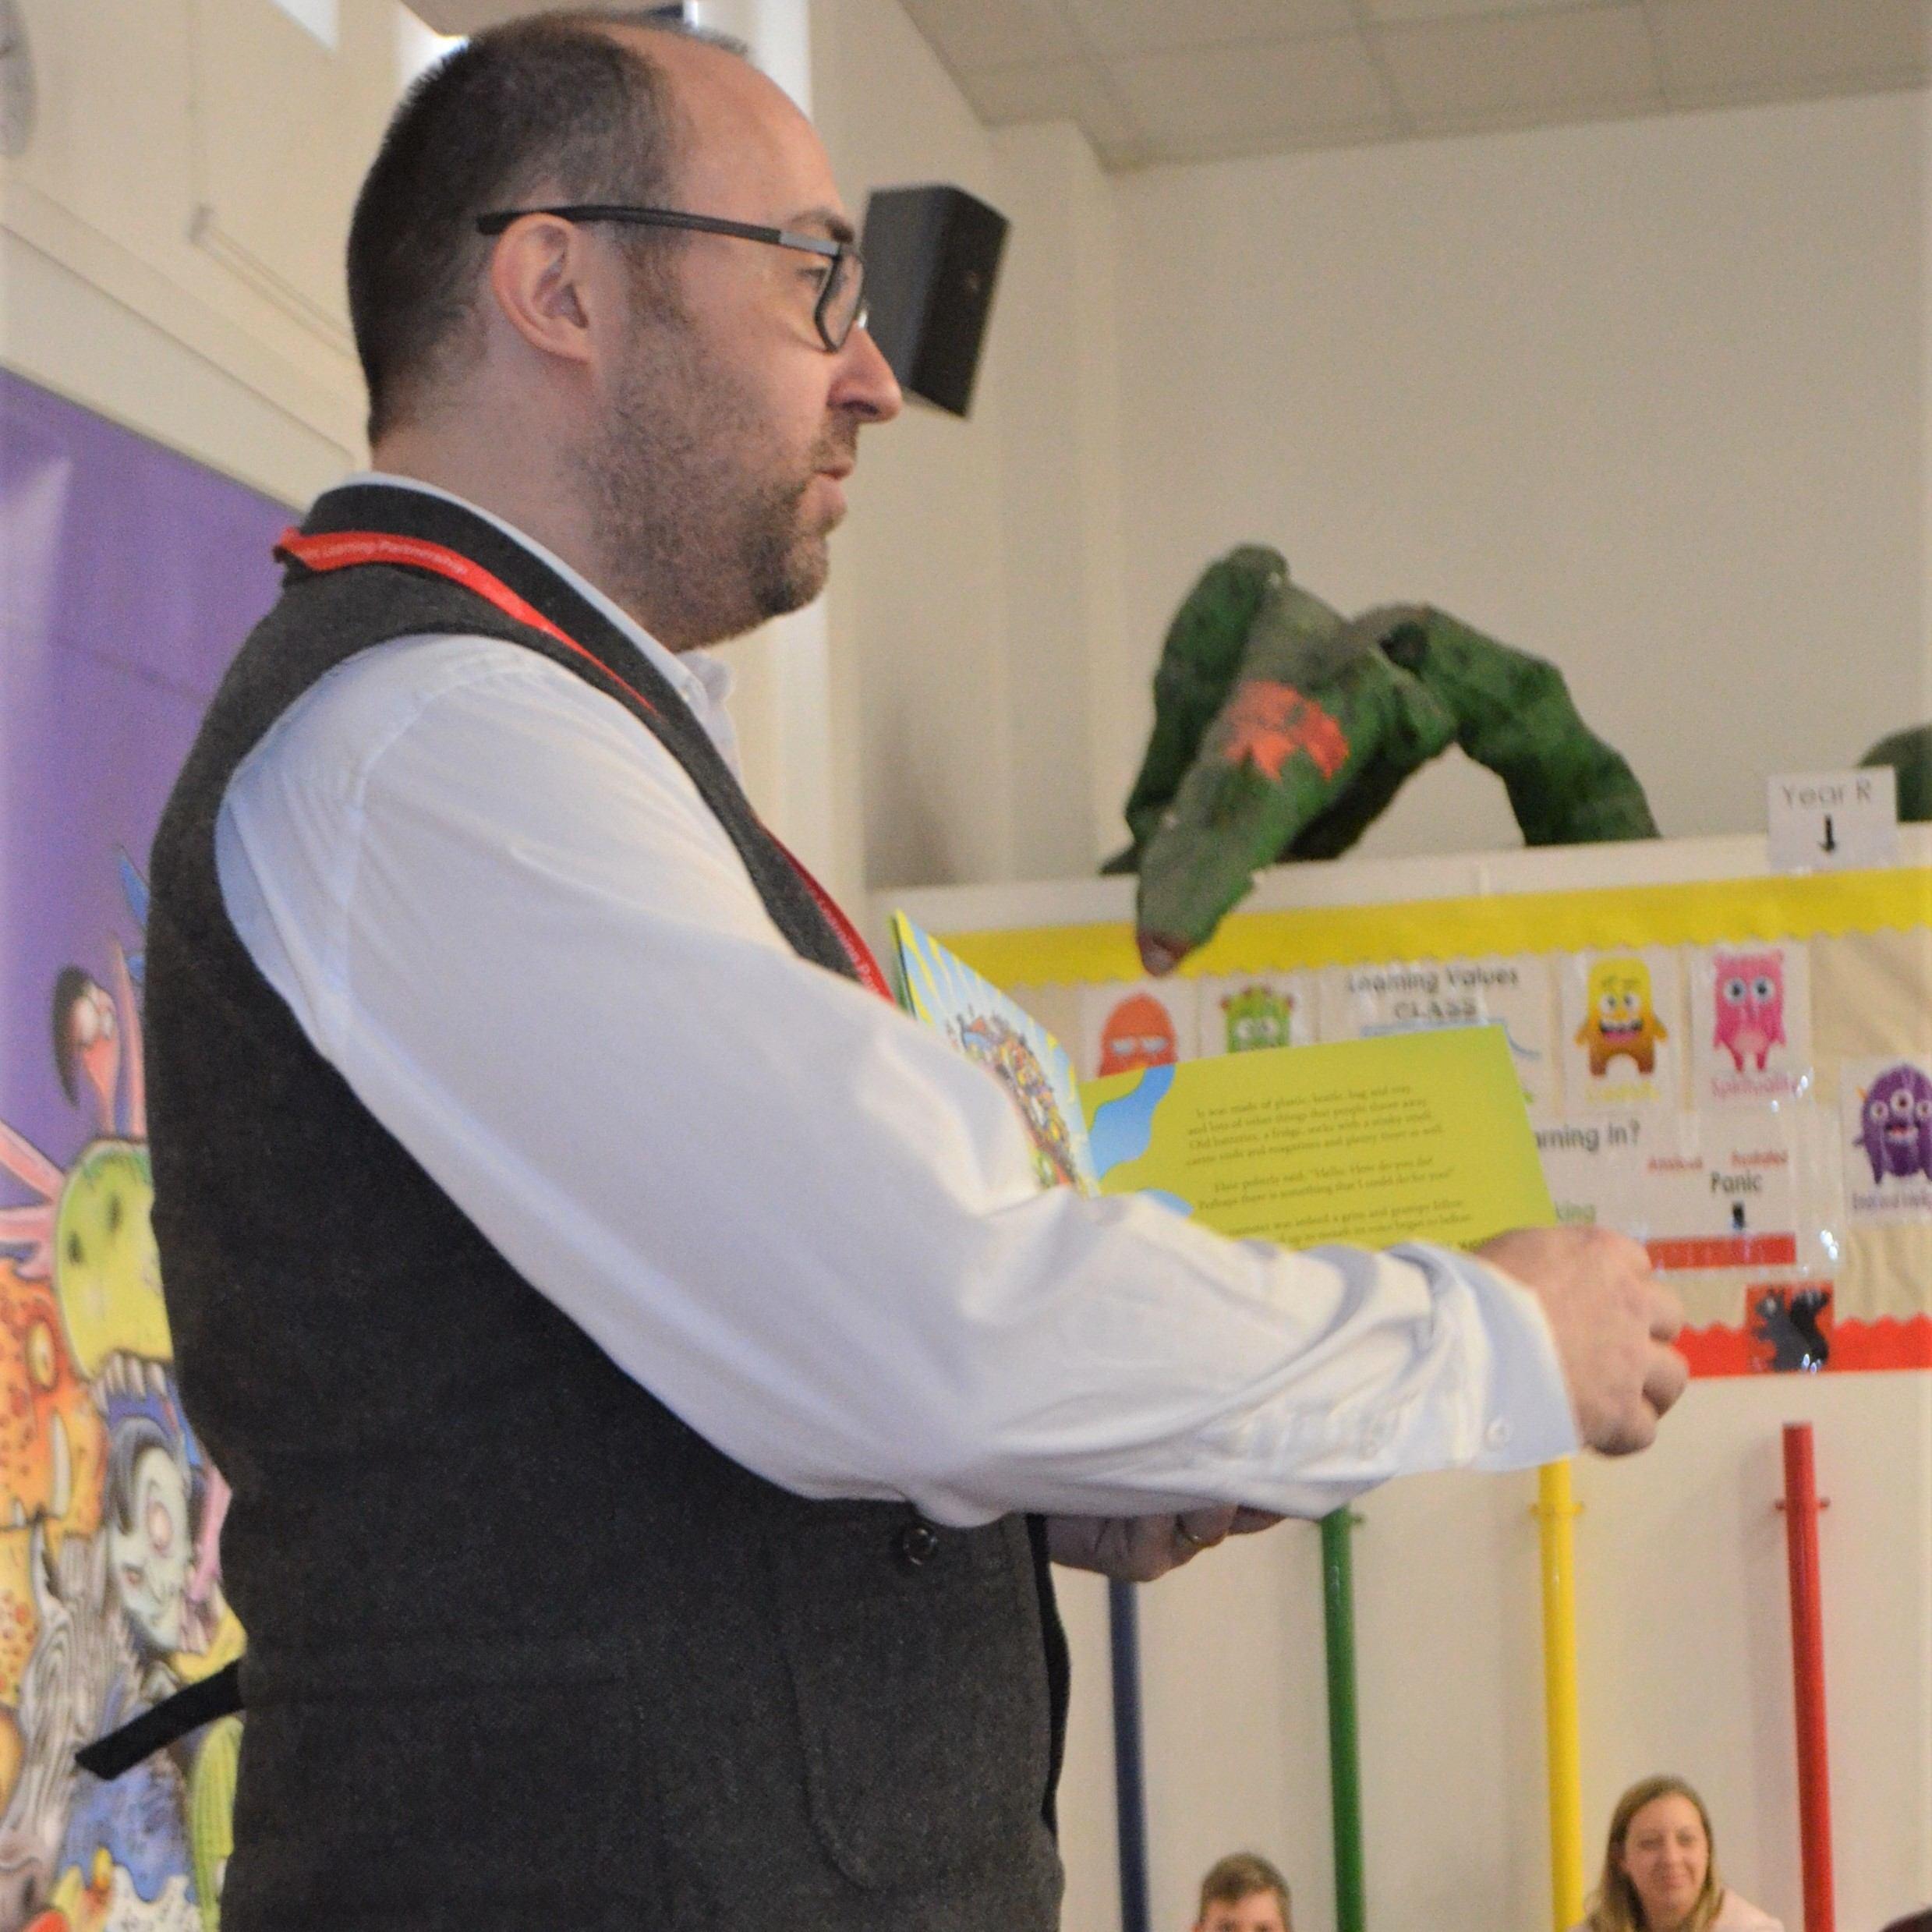 Simon reading to children at Blackfield Primary School